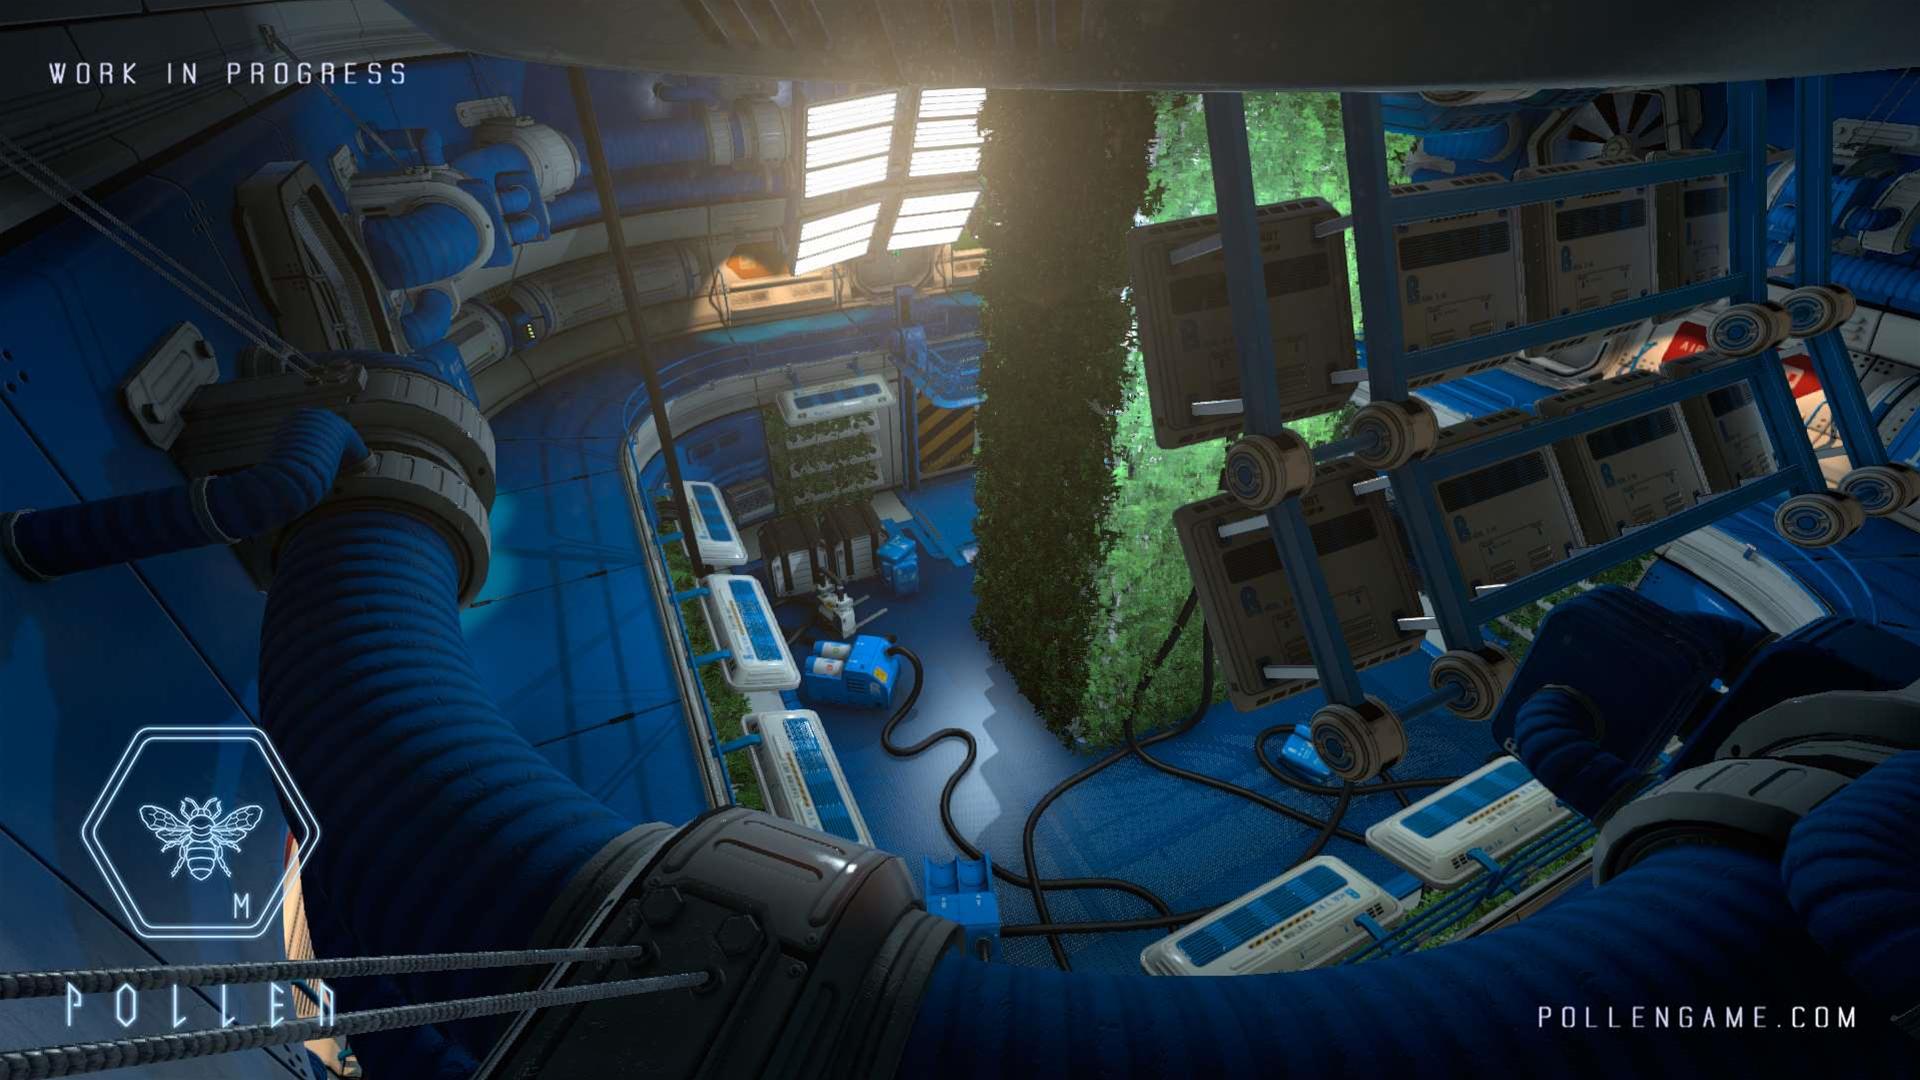 VR game P.O.L.L.E.N is coming to PC early next year